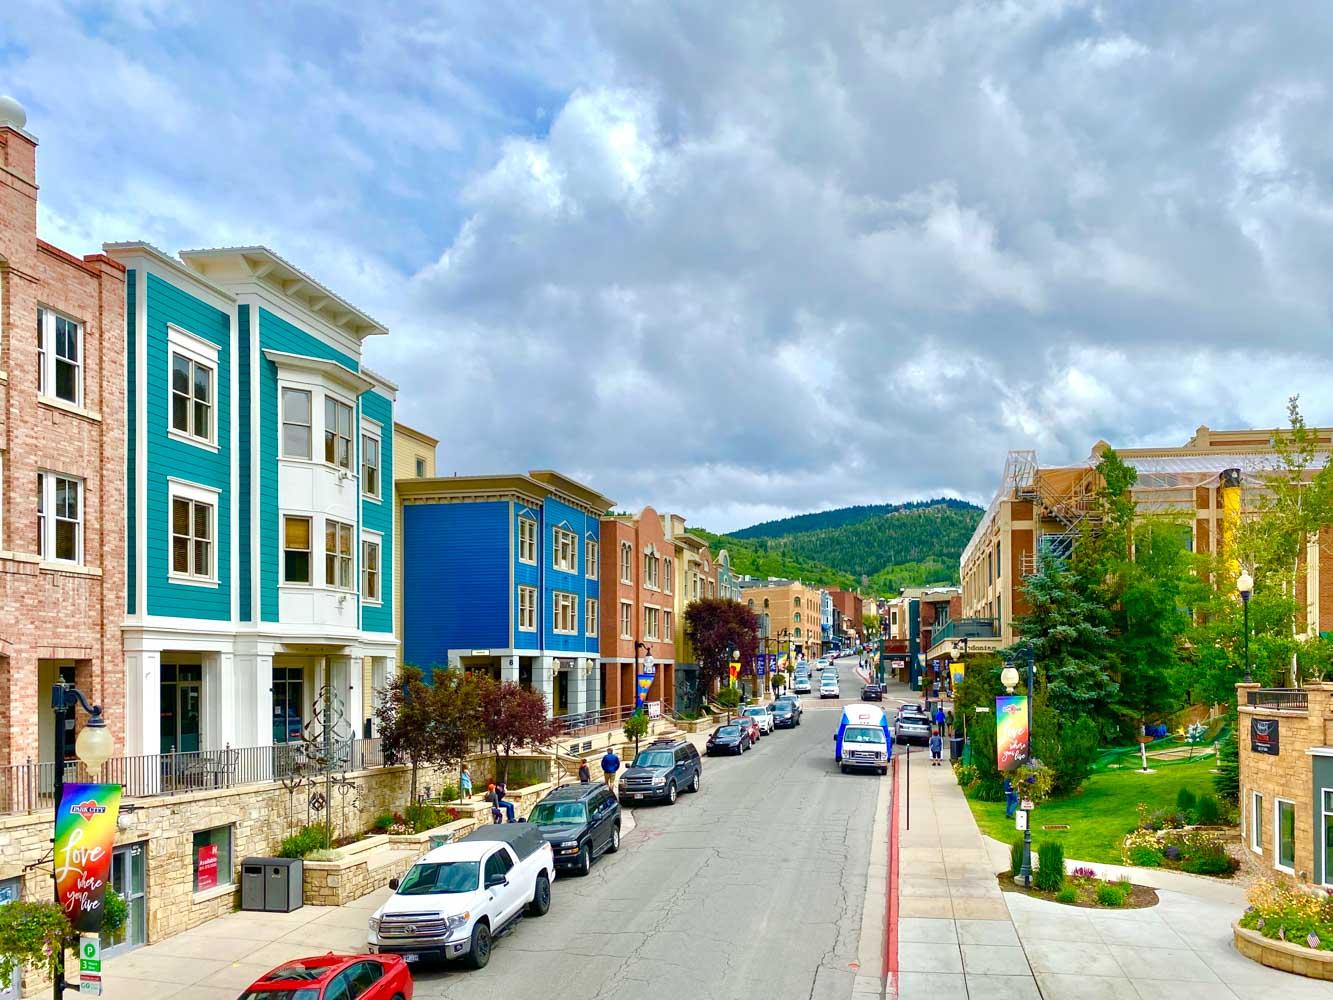 DowntownParkCity Life Elevated - Exploring Park City, Utah